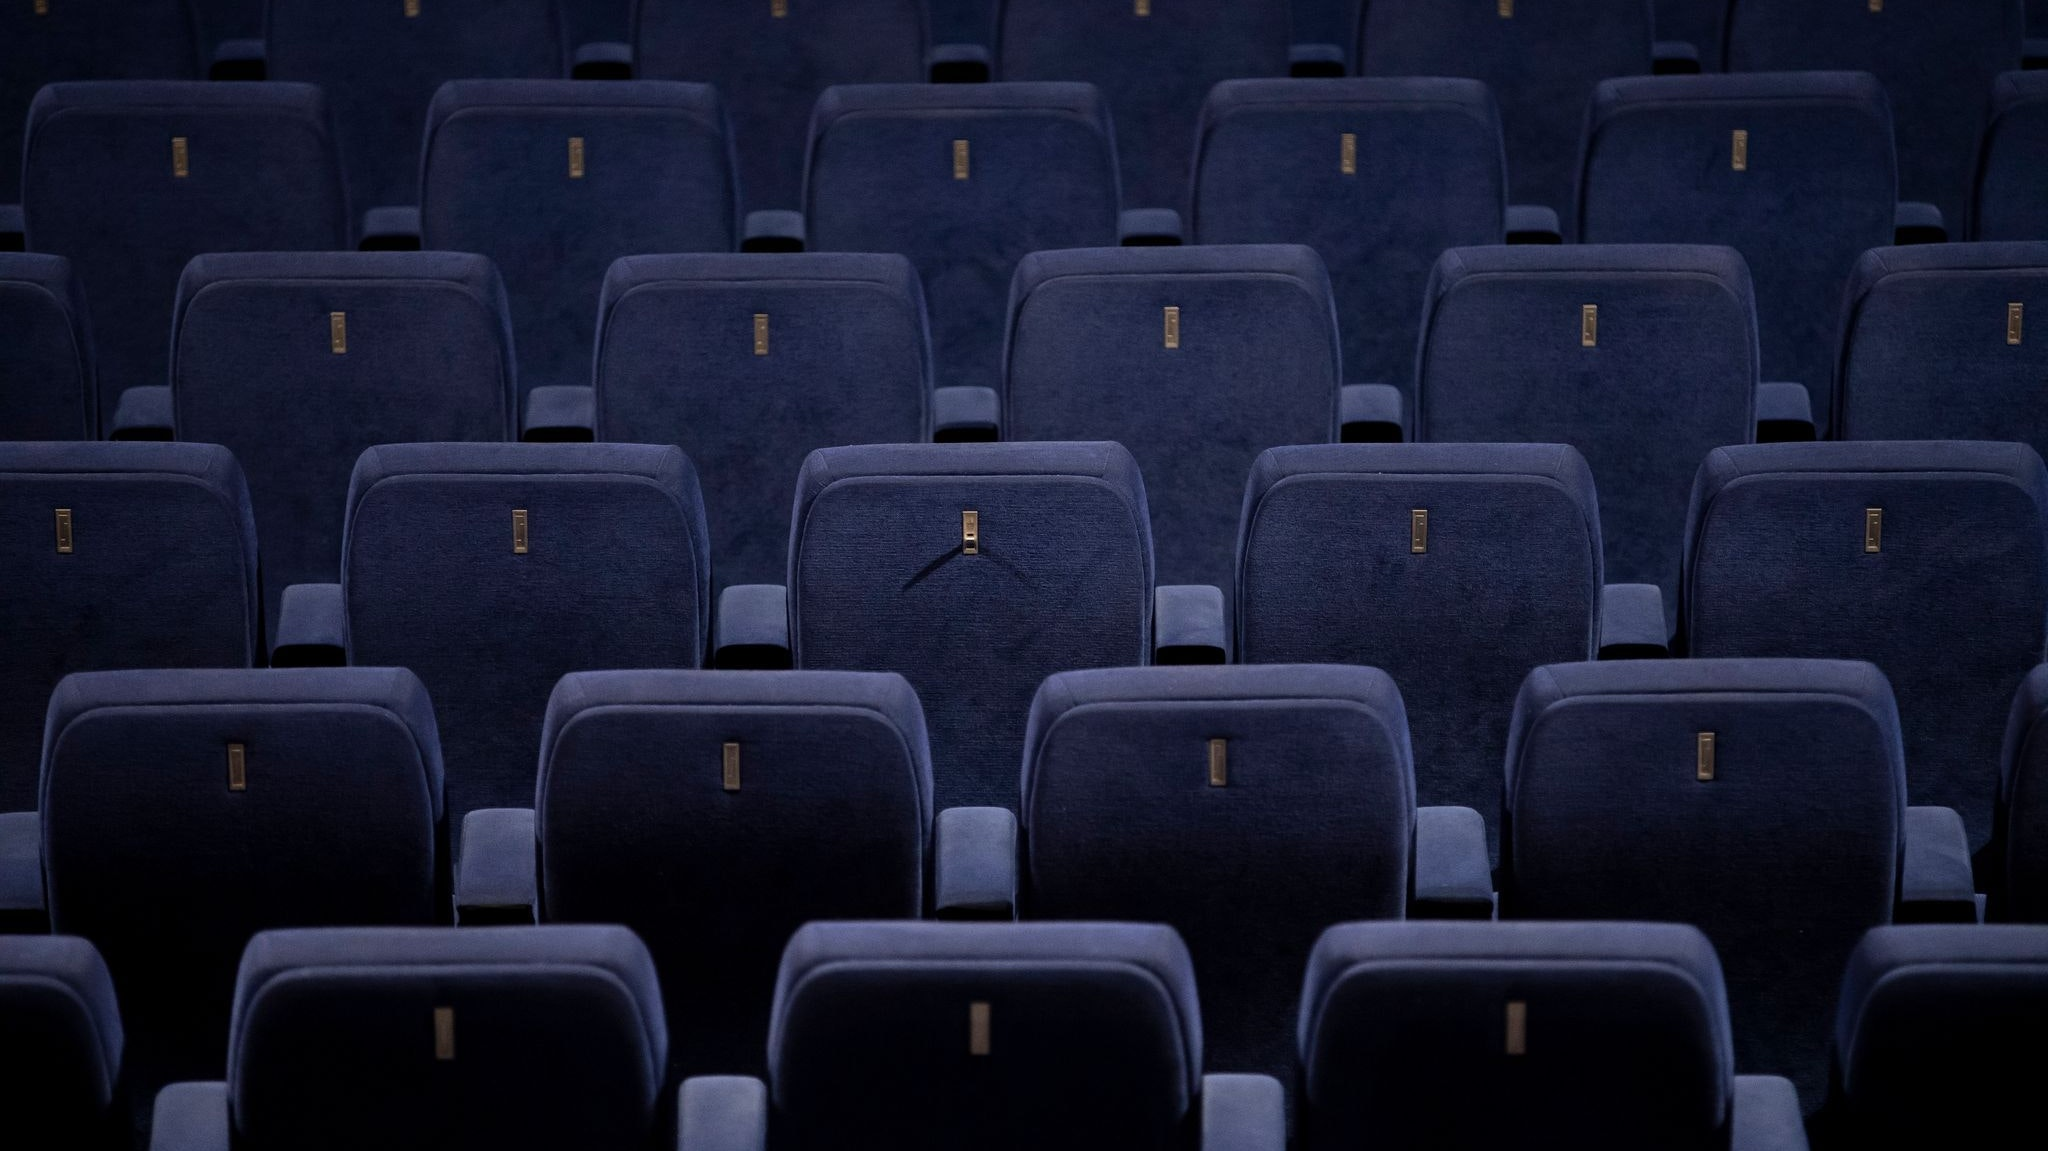 Leere Sessel sind in einem Kinosaal zu sehen.Christoph Soeder/dpa/Symbolbild